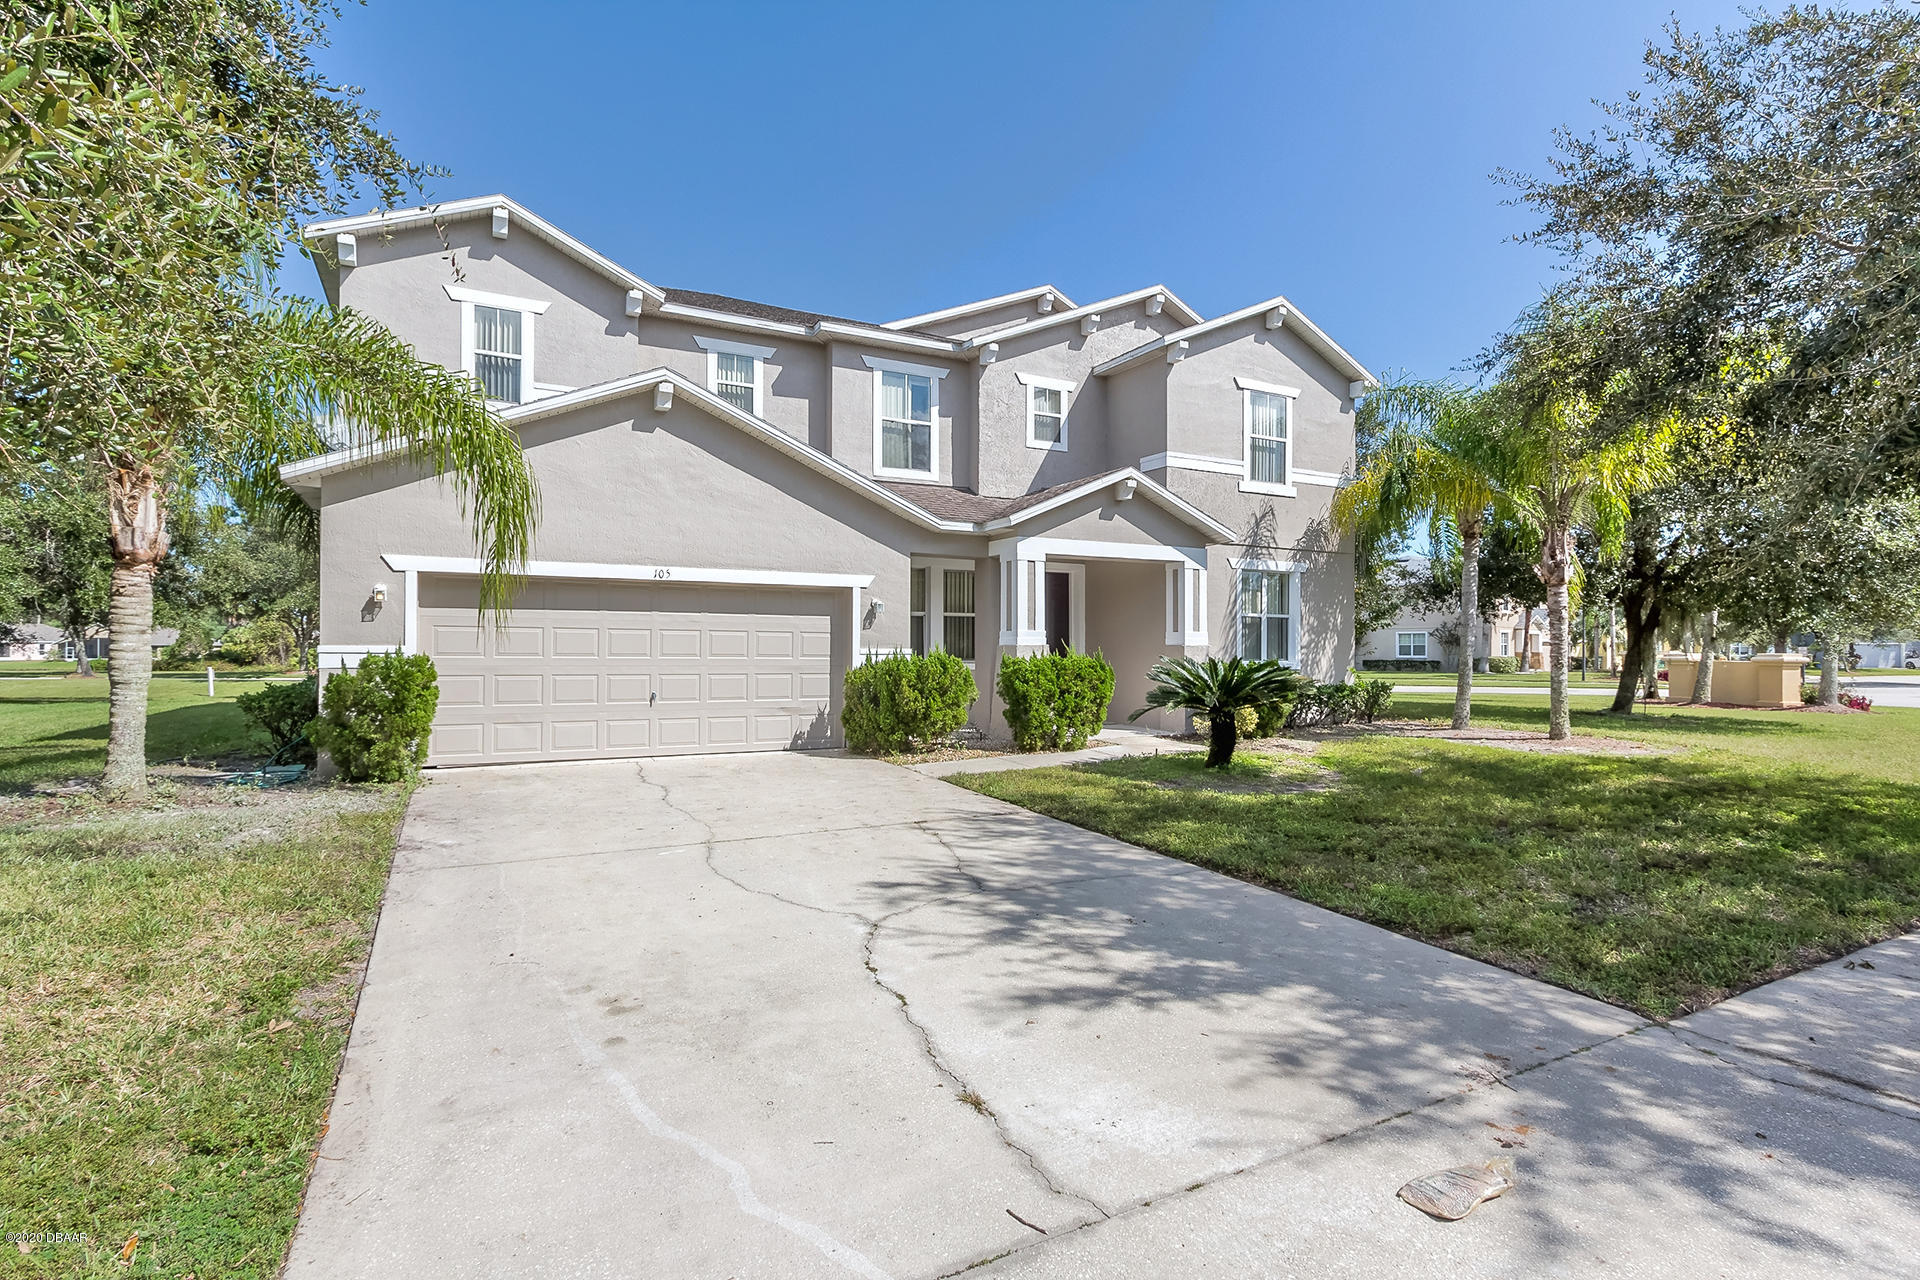 Details for 105 Joyelle Circle, Daytona Beach, FL 32124